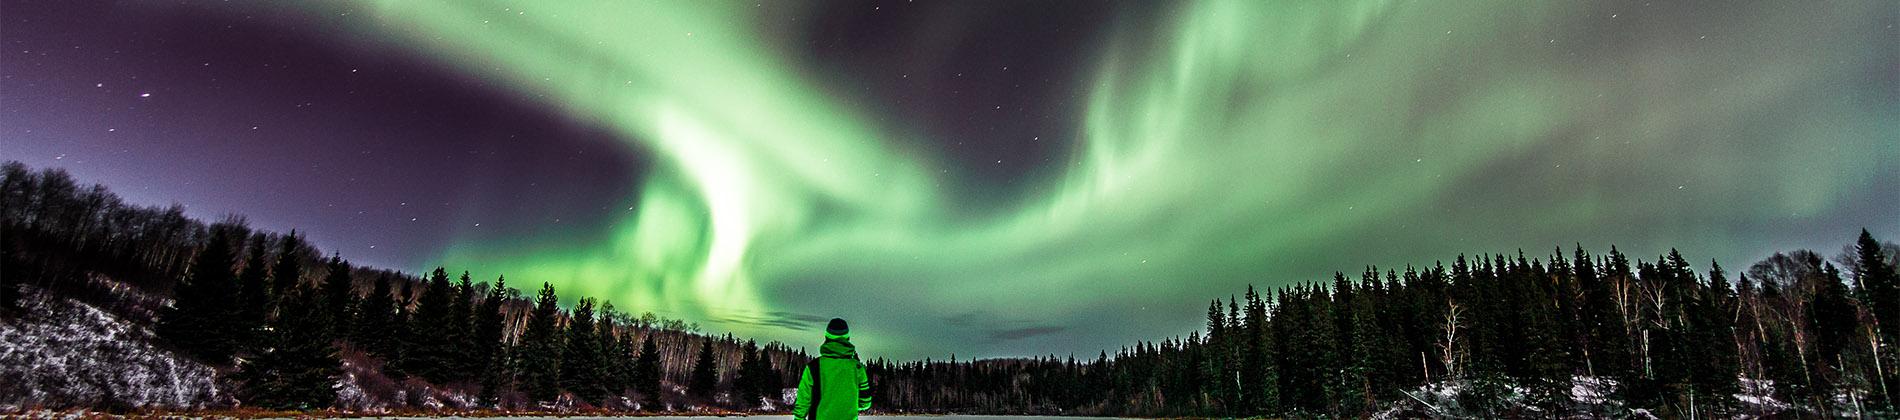 Northern-Lights-Web-Slider